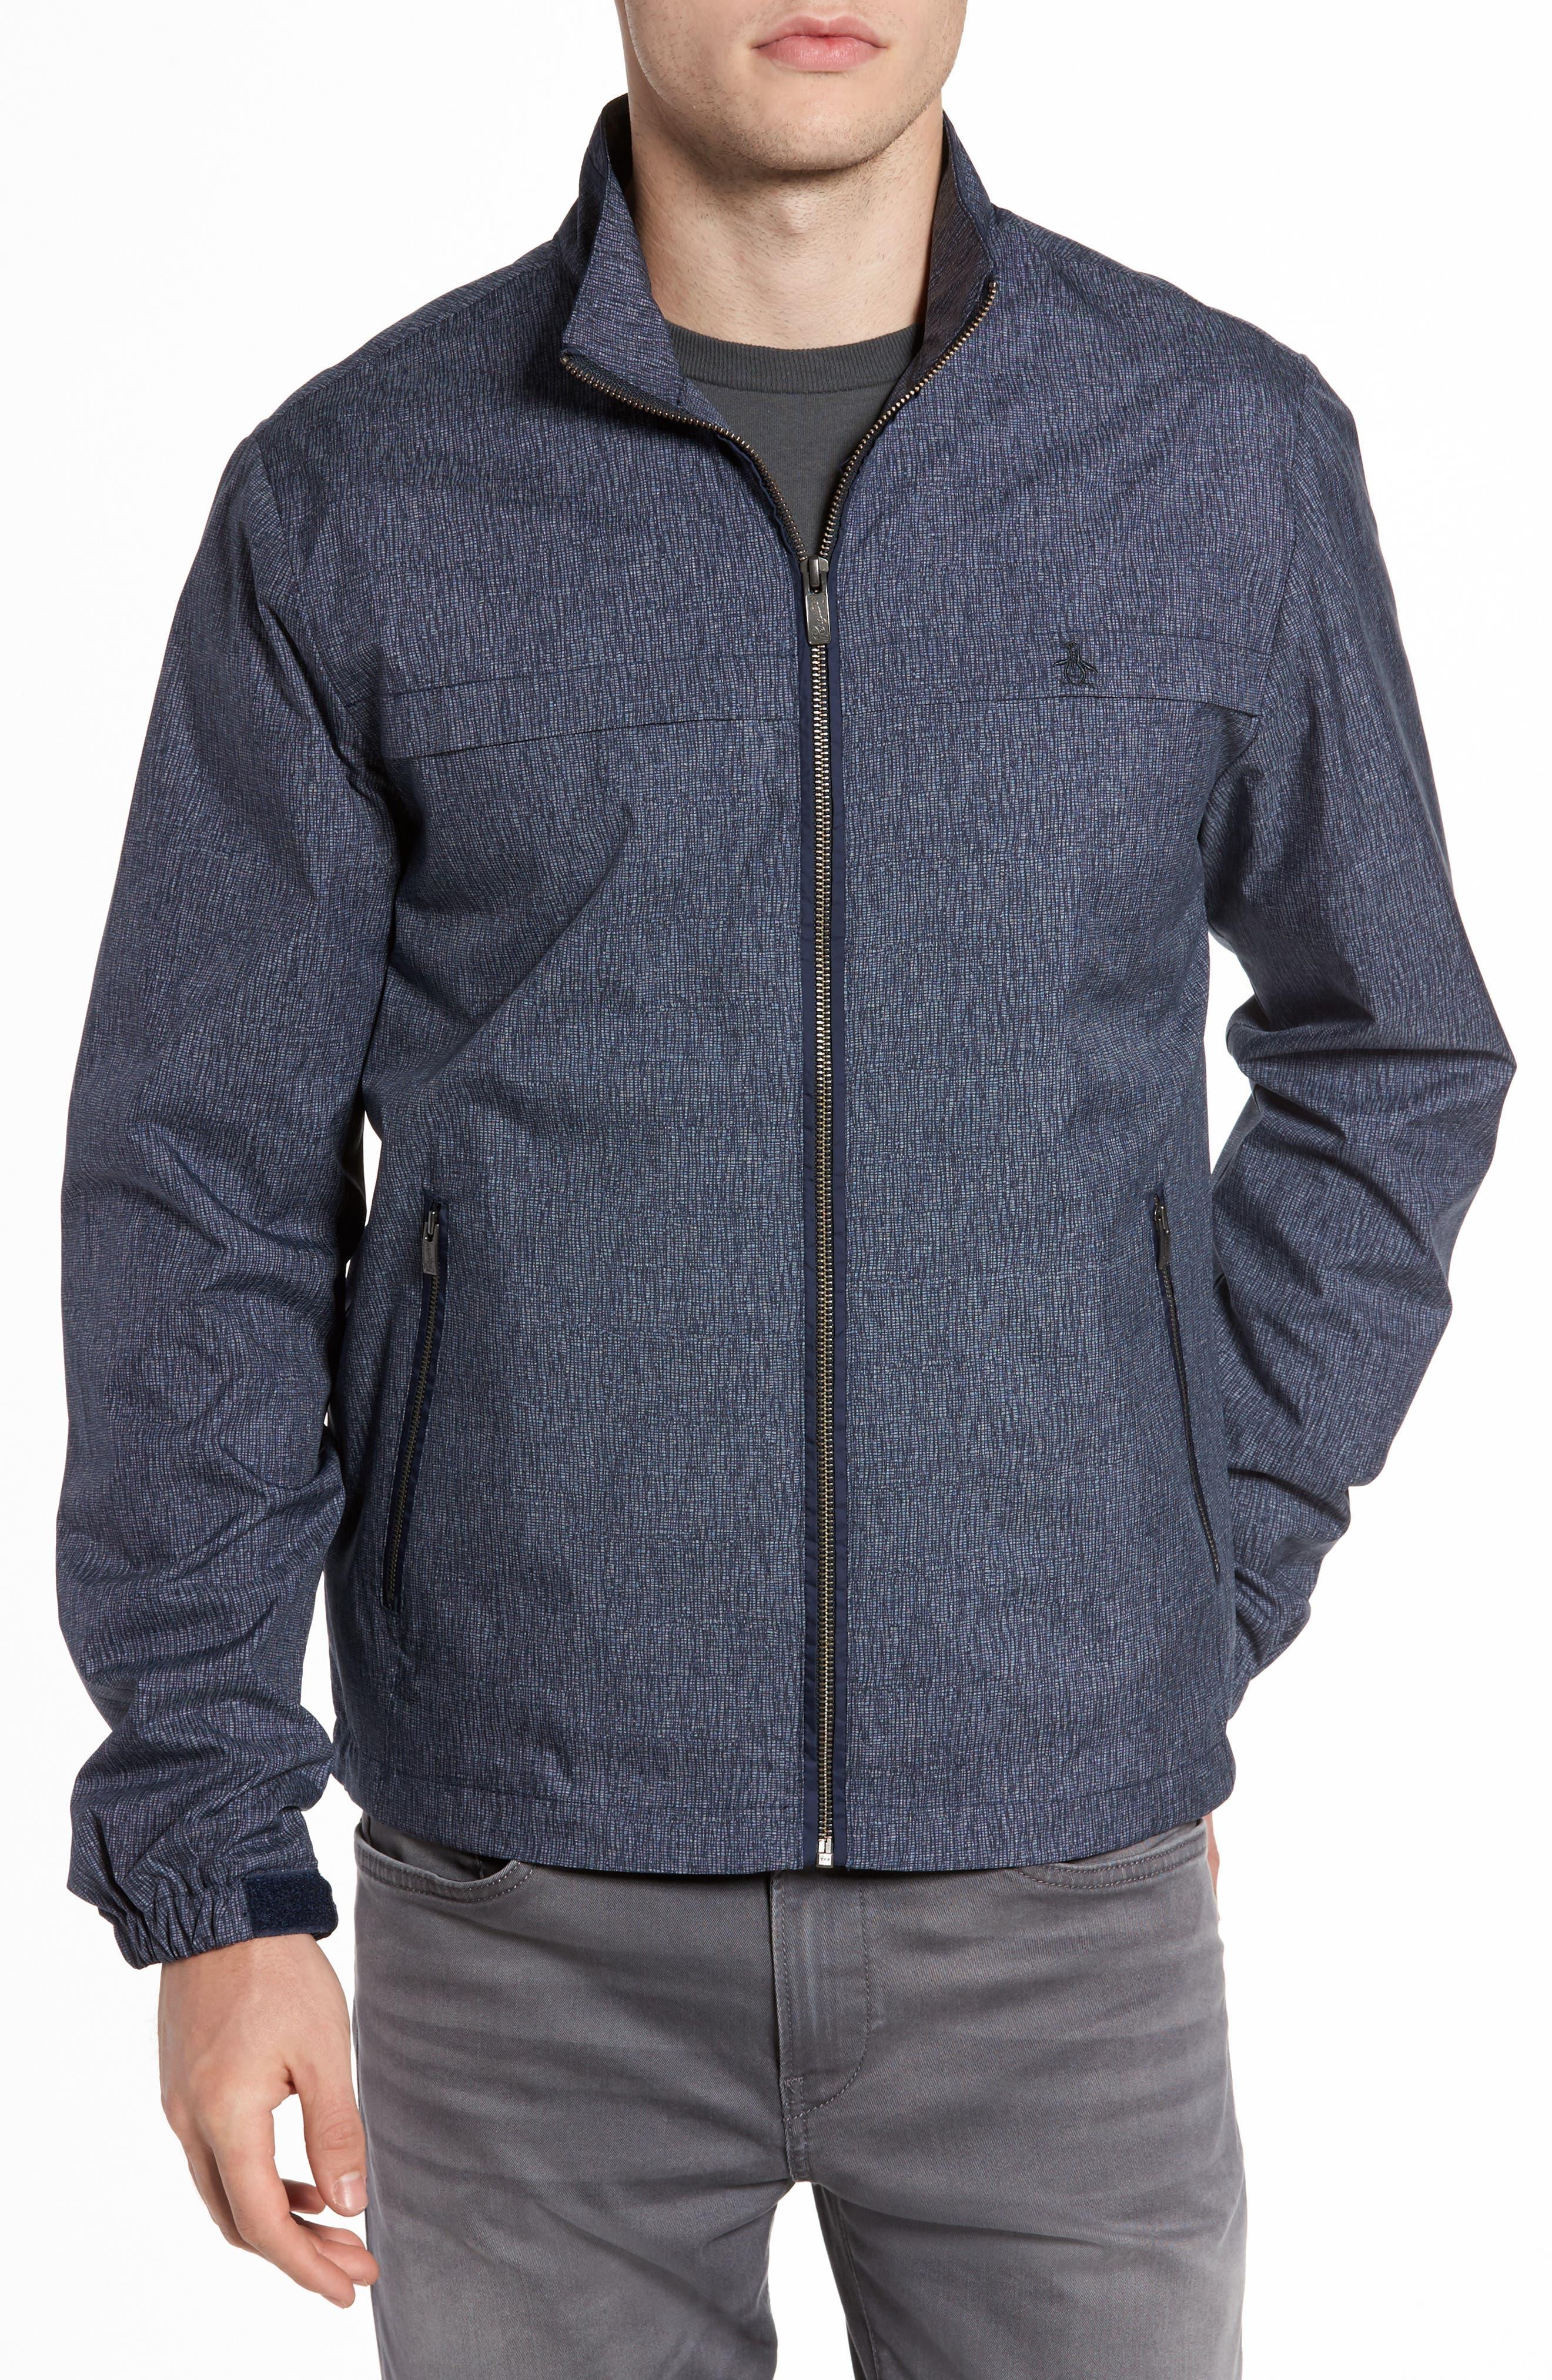 Ratner Water Resistant Jacket,                         Main,                         color, Dark Sapphire